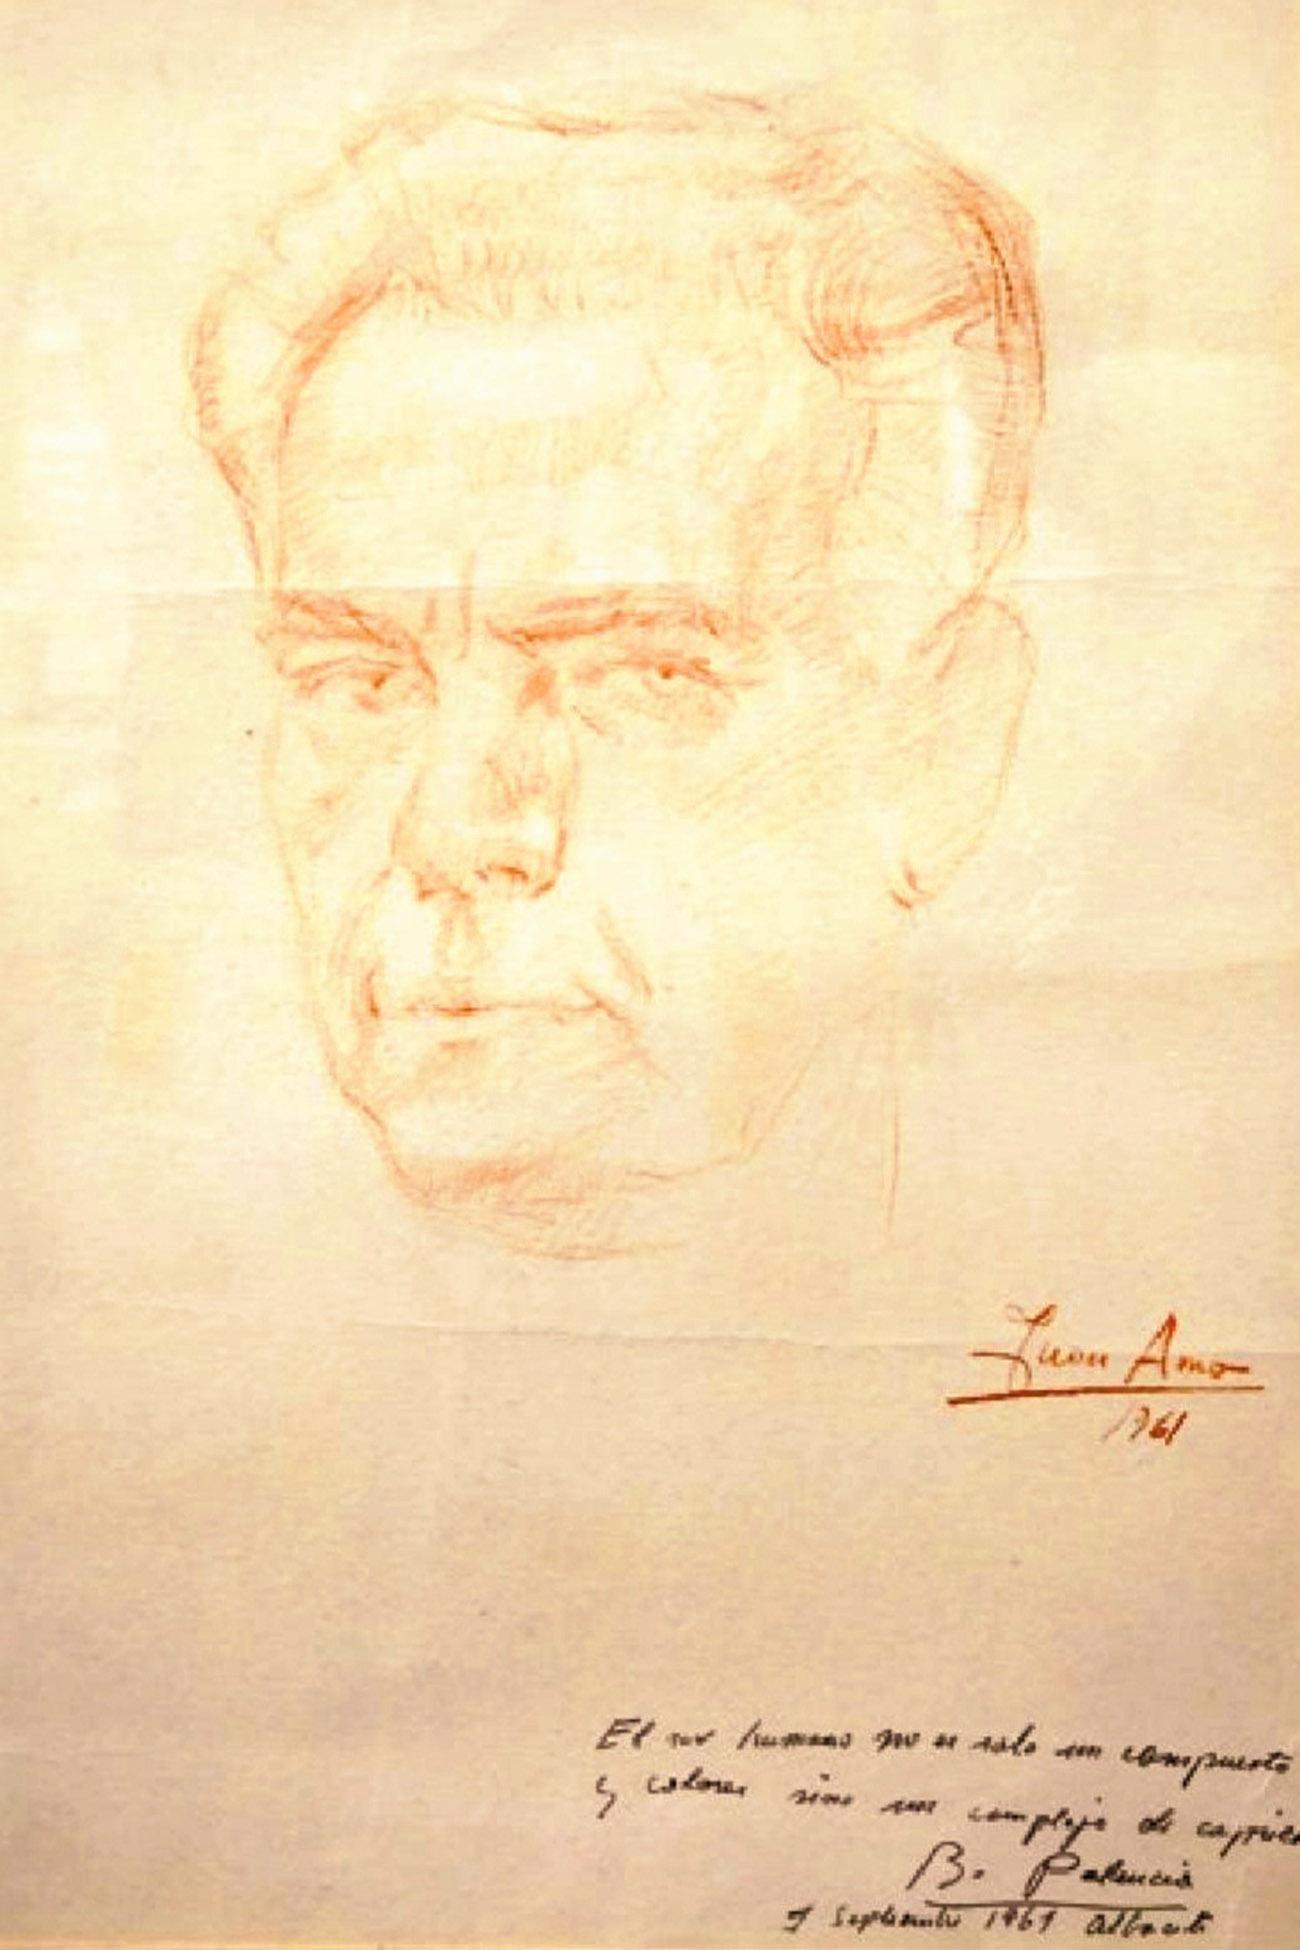 BENJAMÍN PALENCIA. Dibujo de Juan Amo.